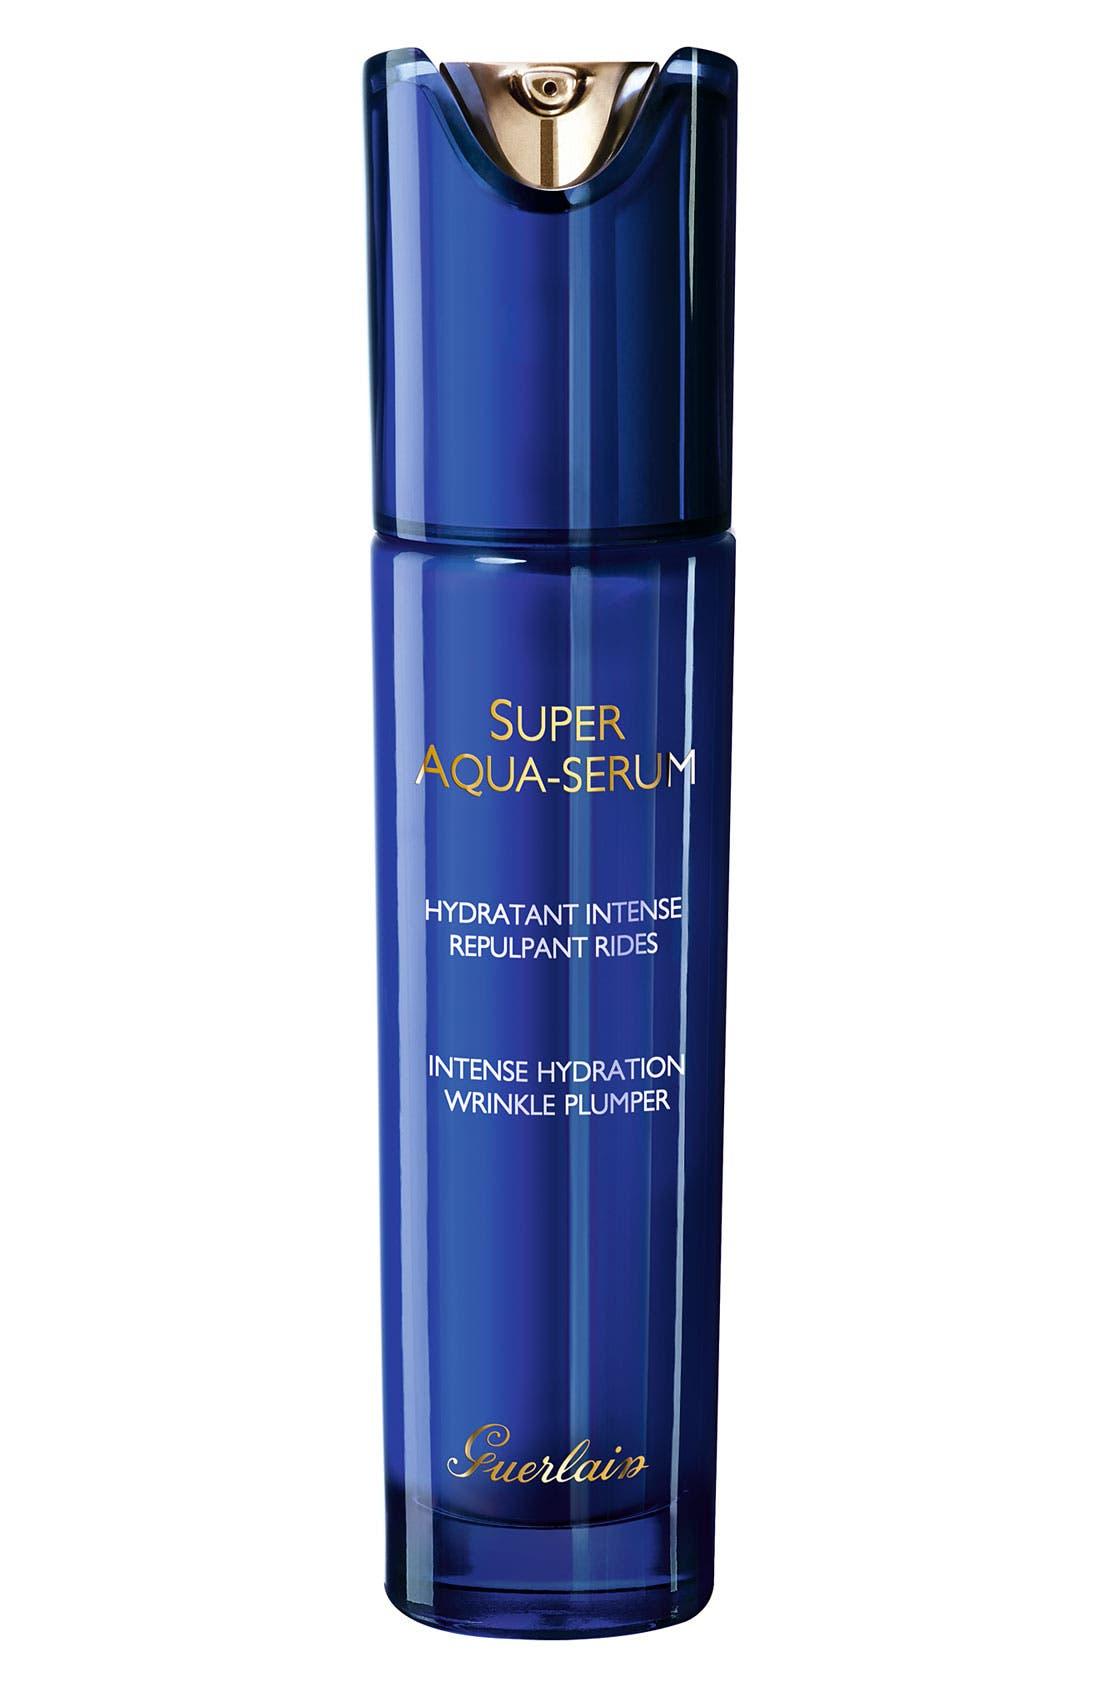 Guerlain 'Super Aqua Serum' Hydrating Wrinkle Plumper